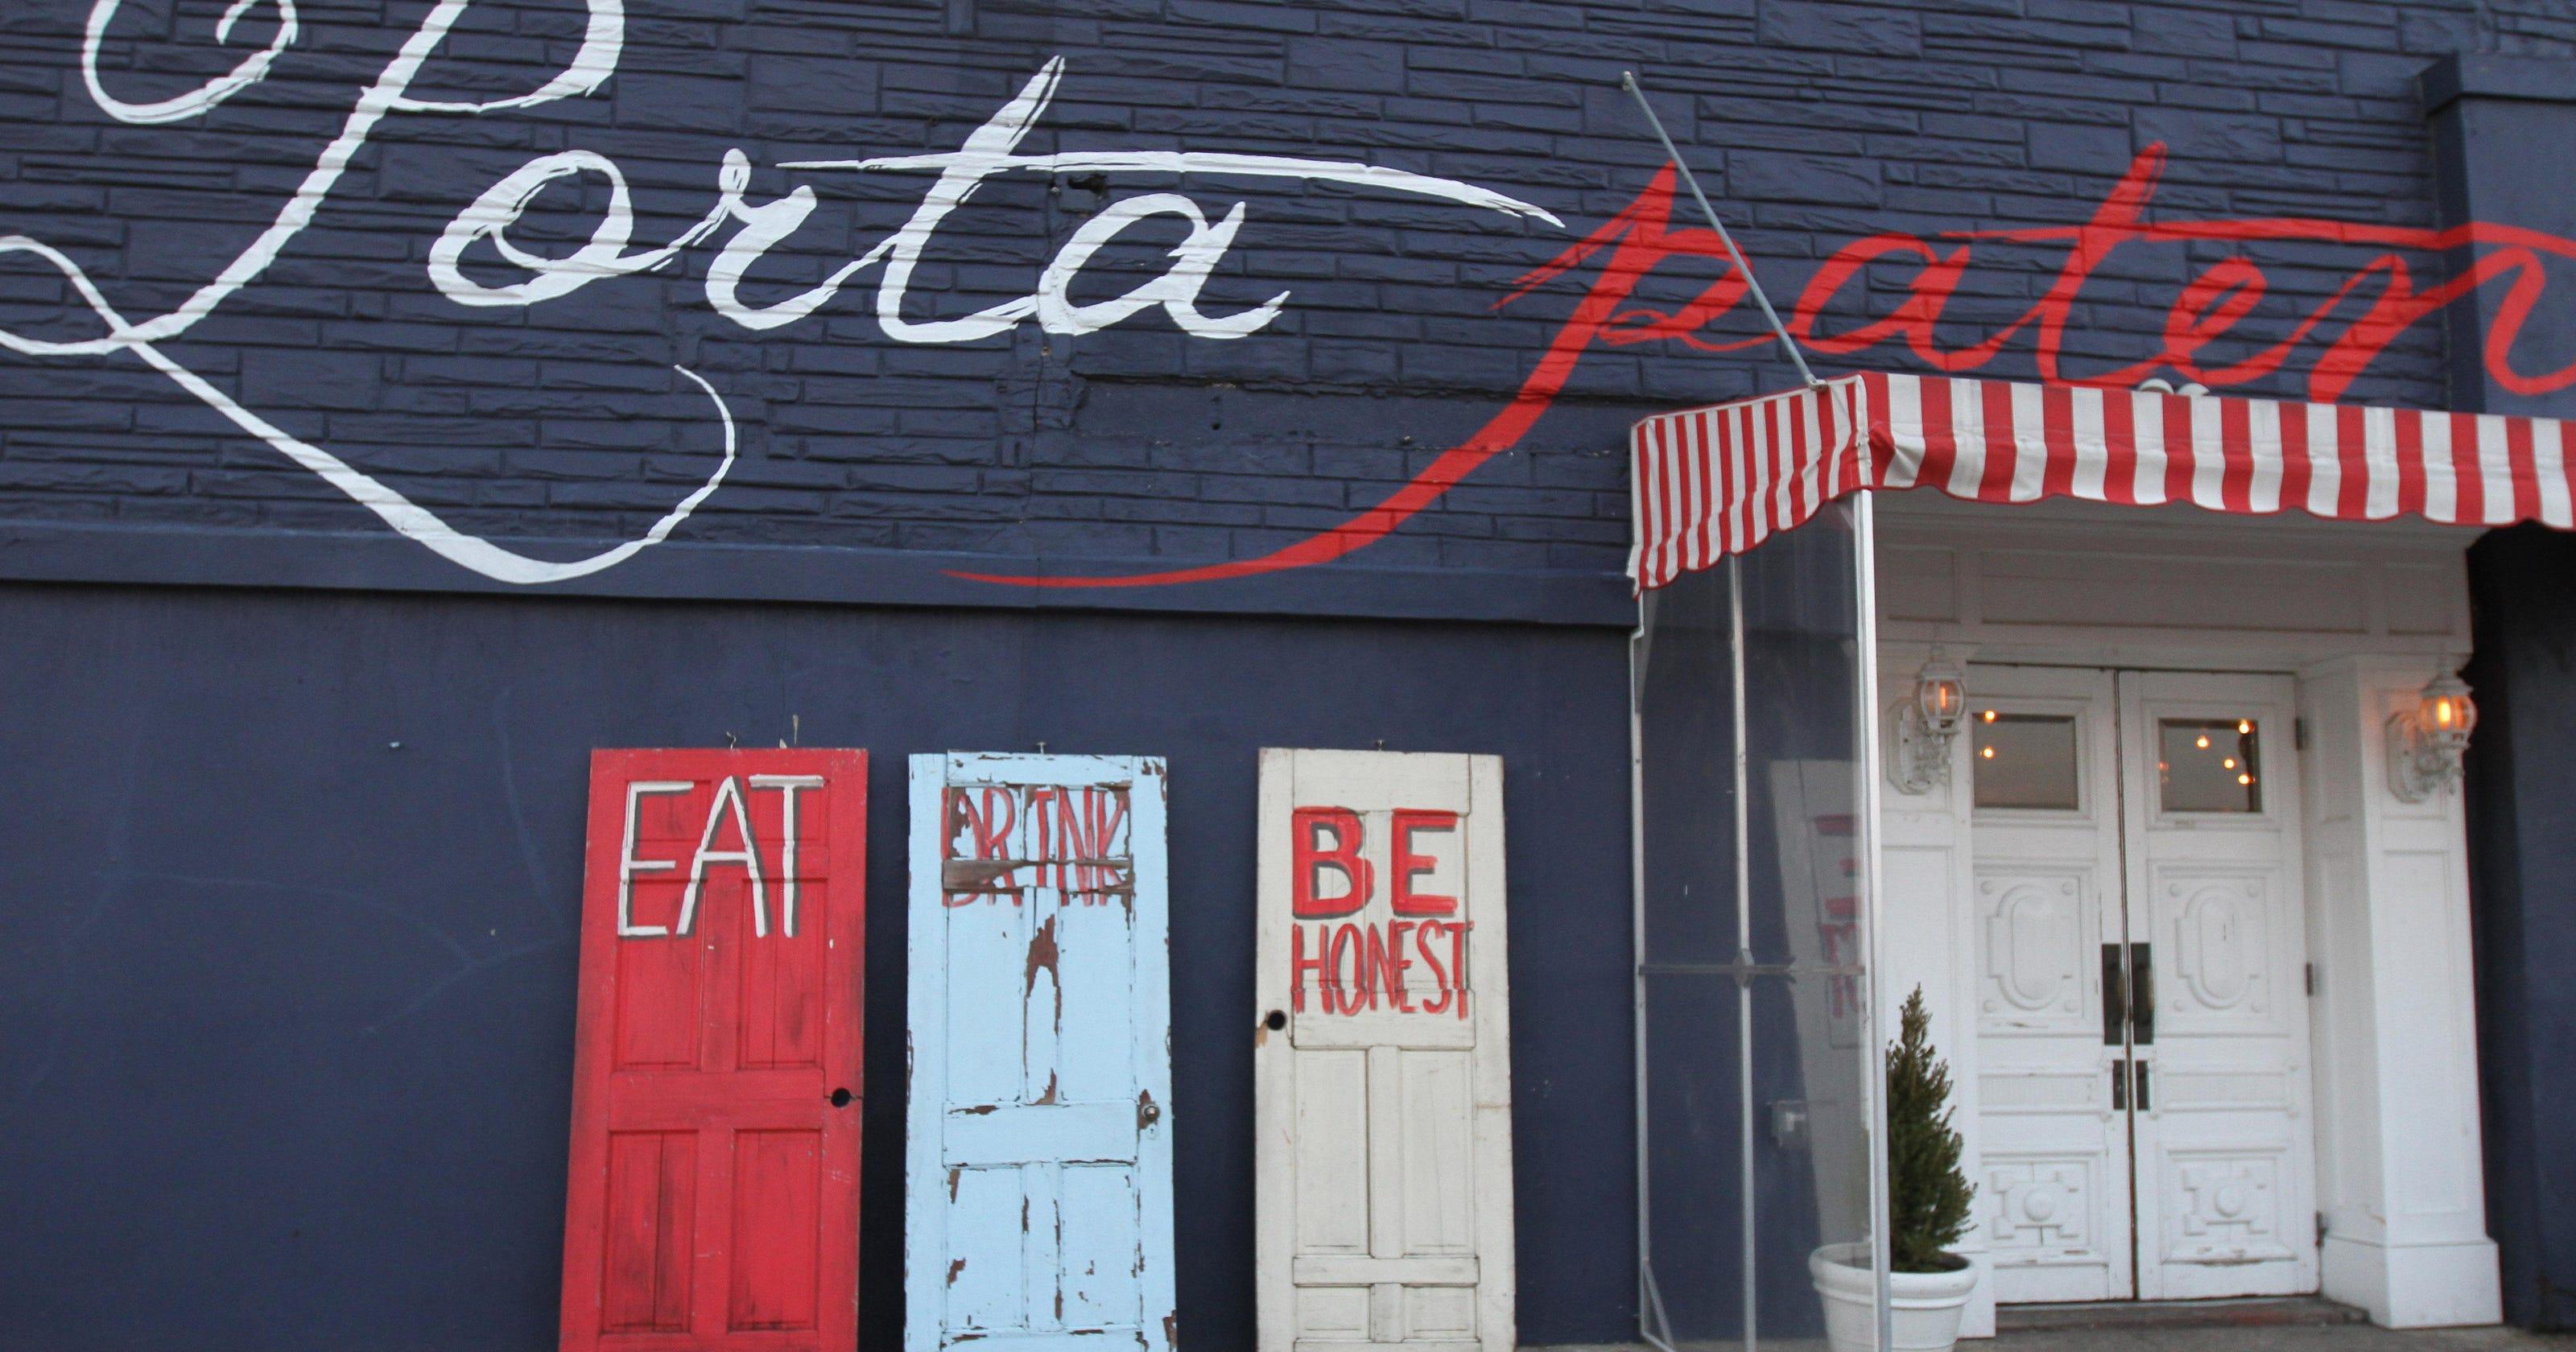 EXCLUSIVE: Porta, other Asbury Park restaurants under